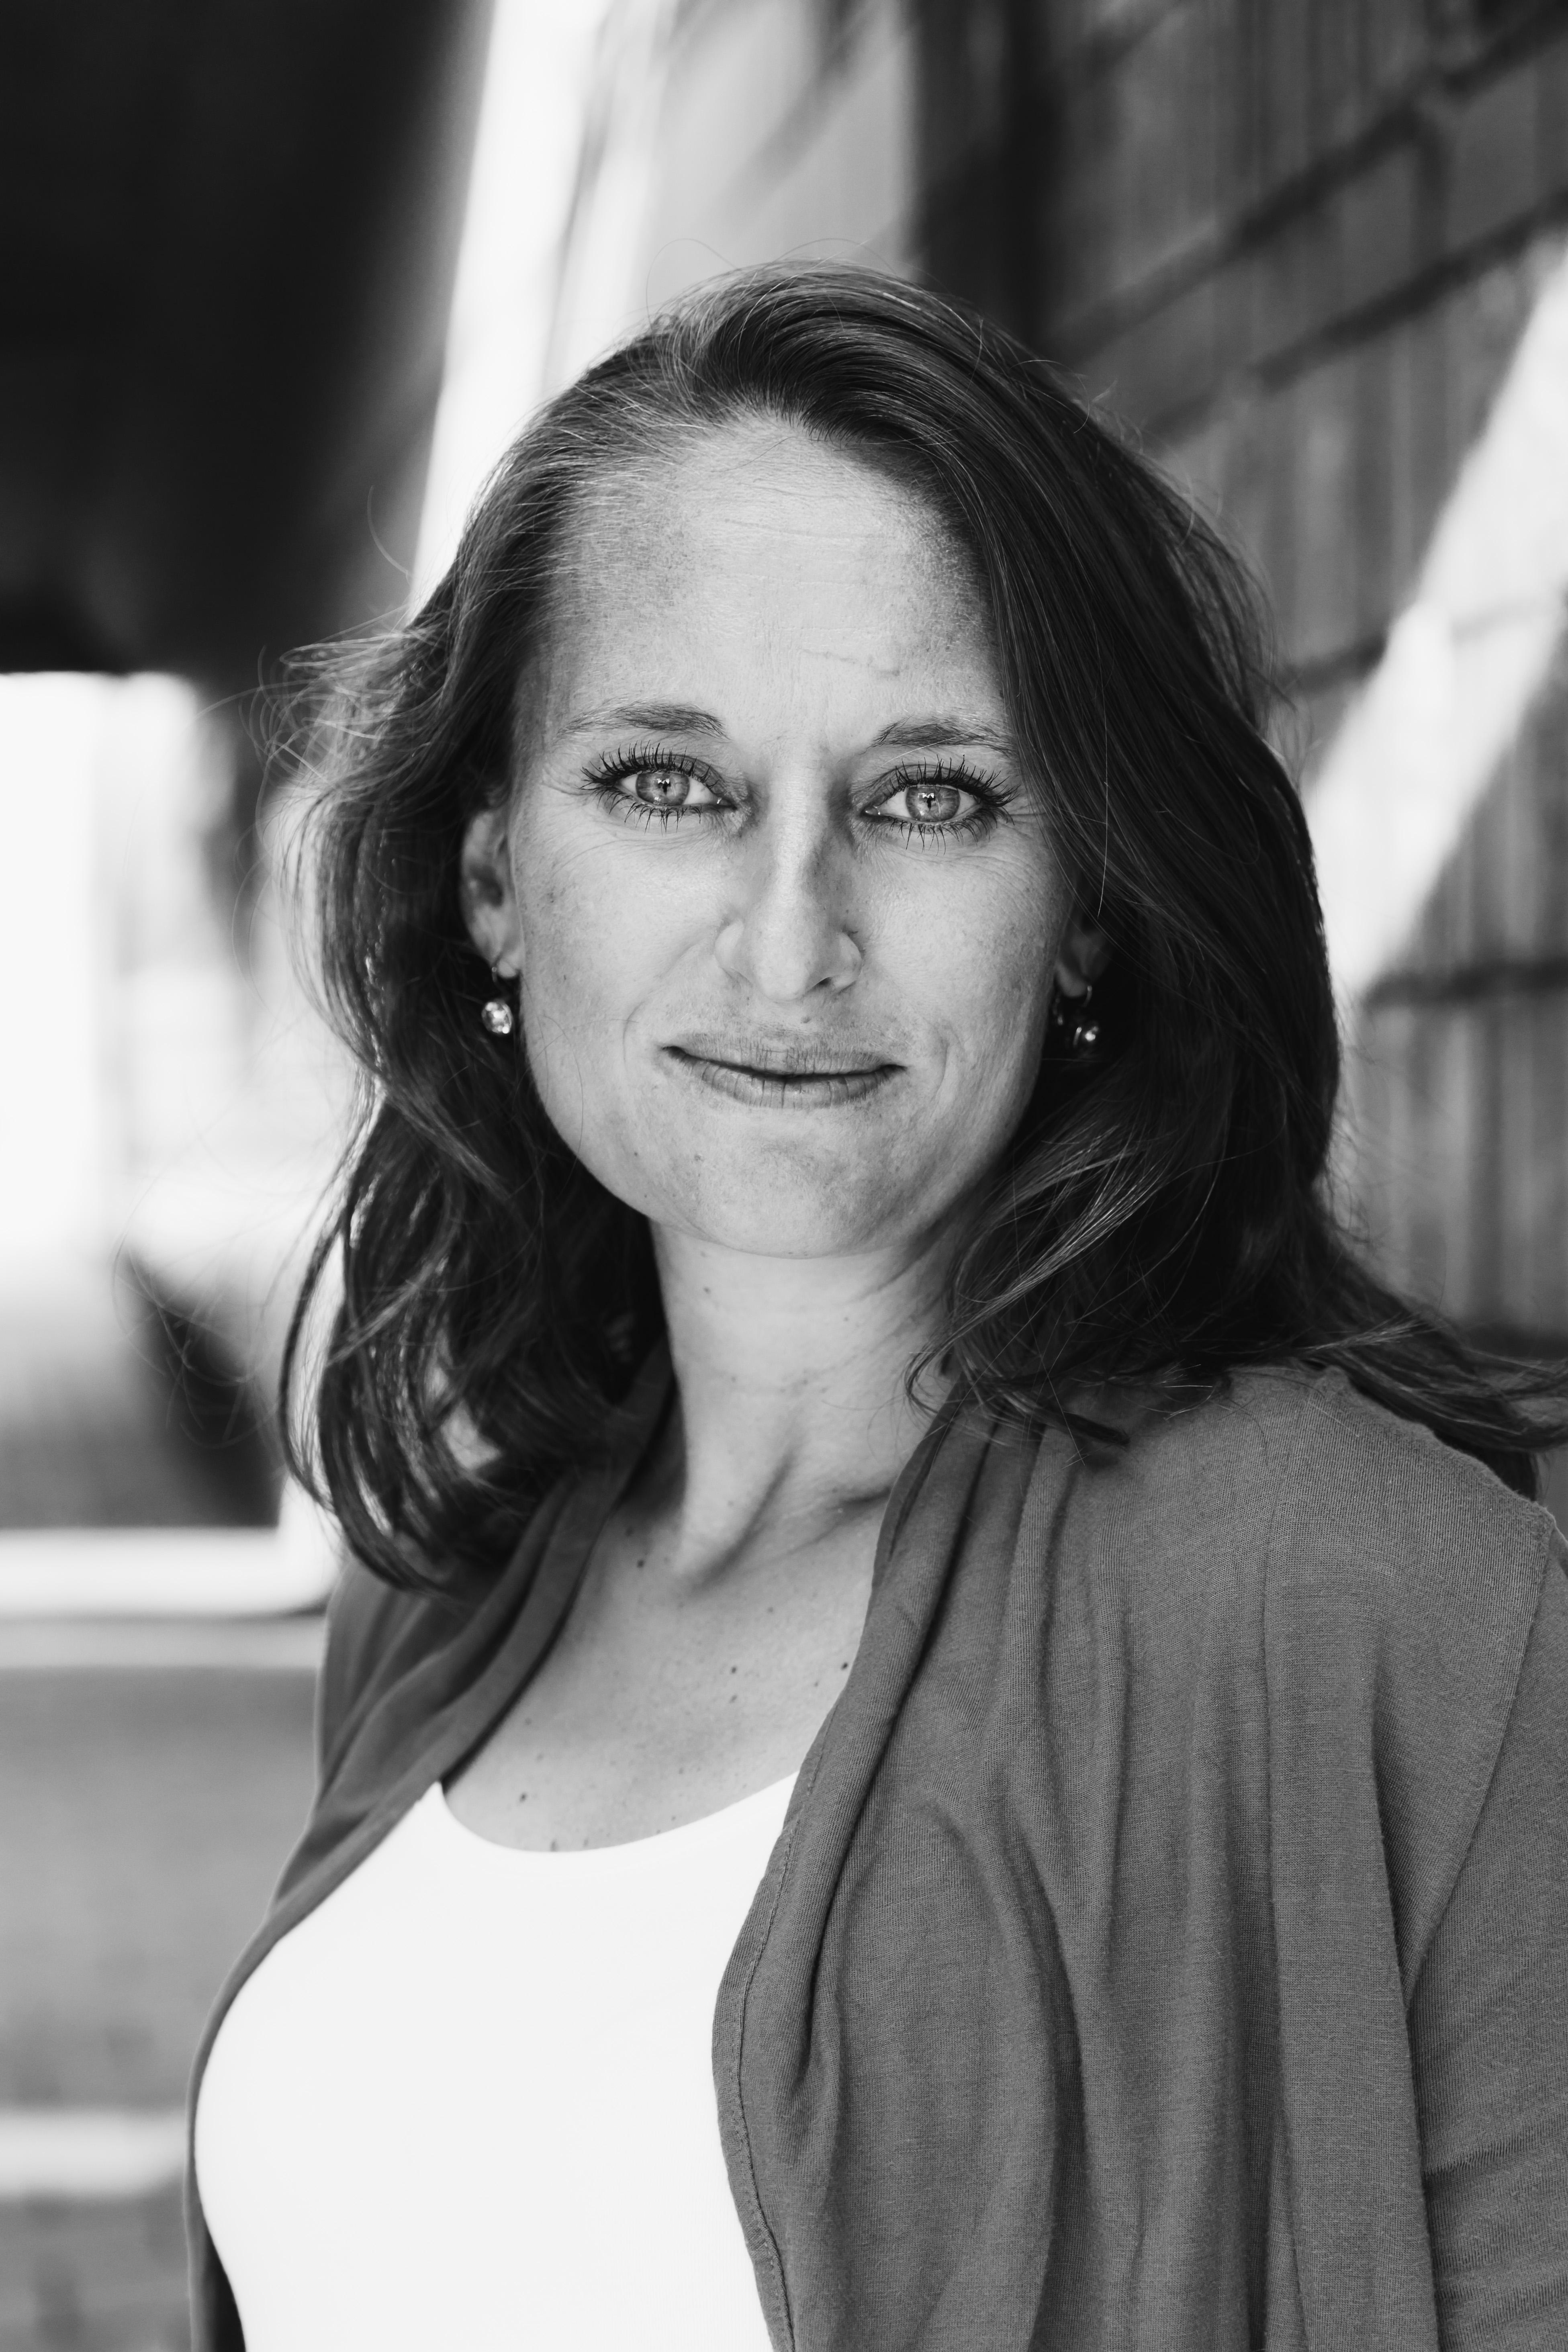 Sarah Claire Moss